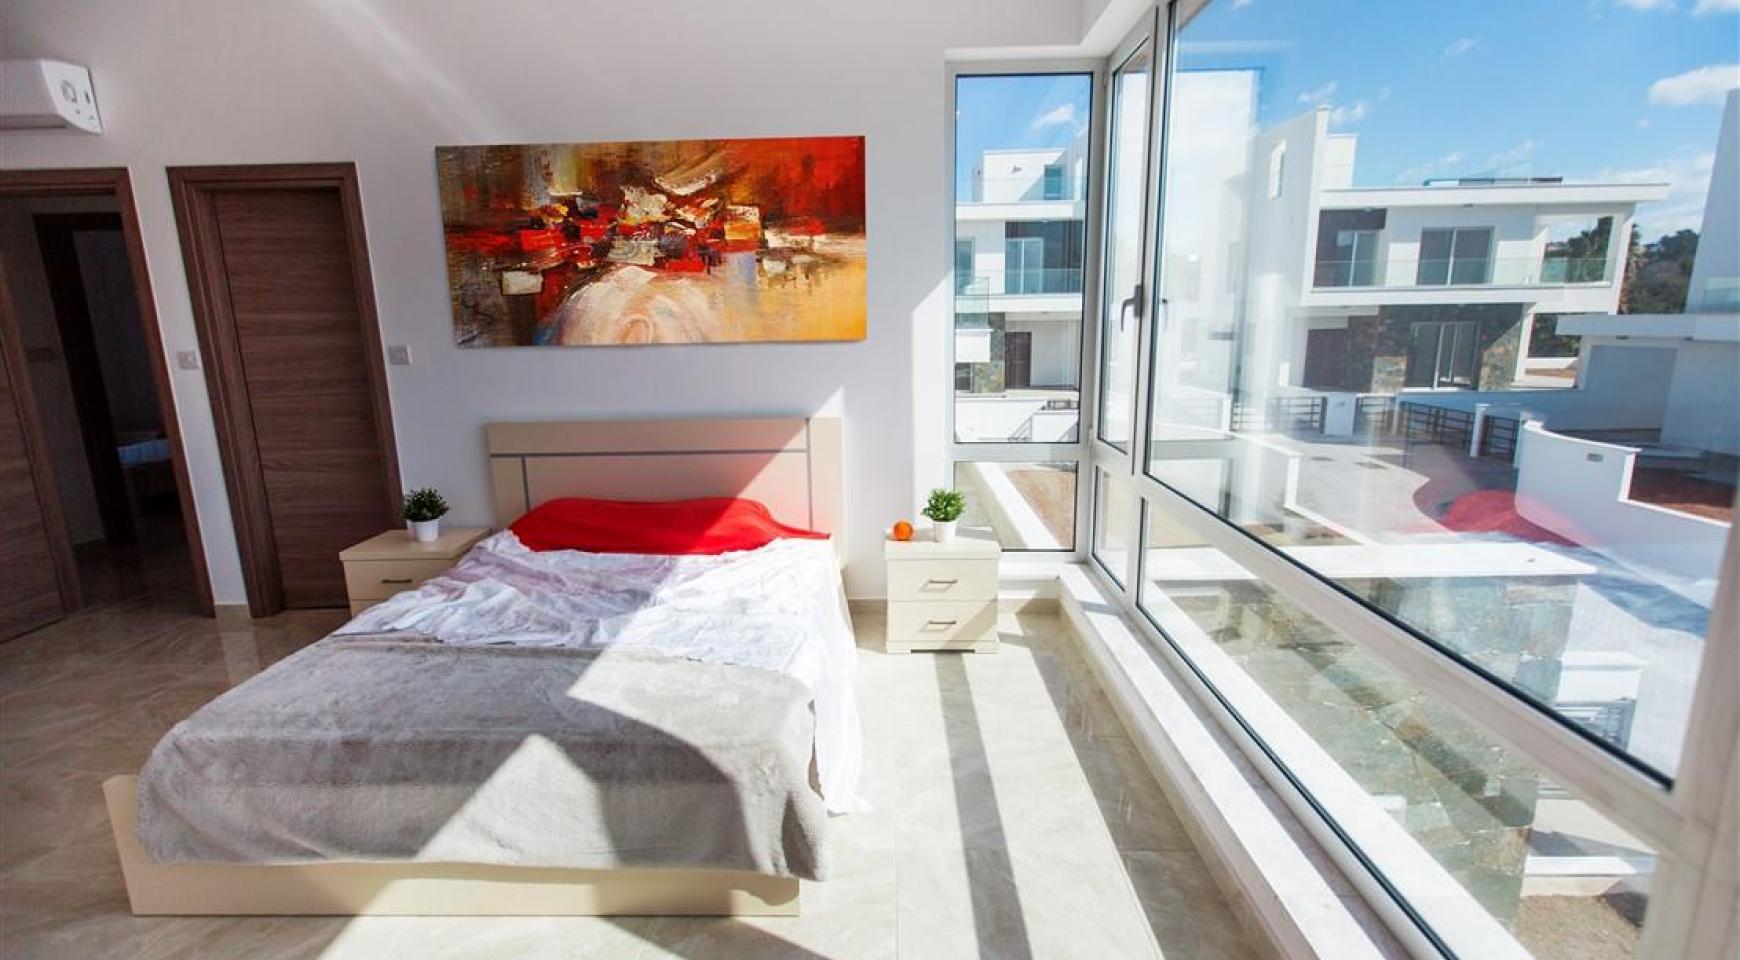 3 Bedroom Villa in Chloraka - 13